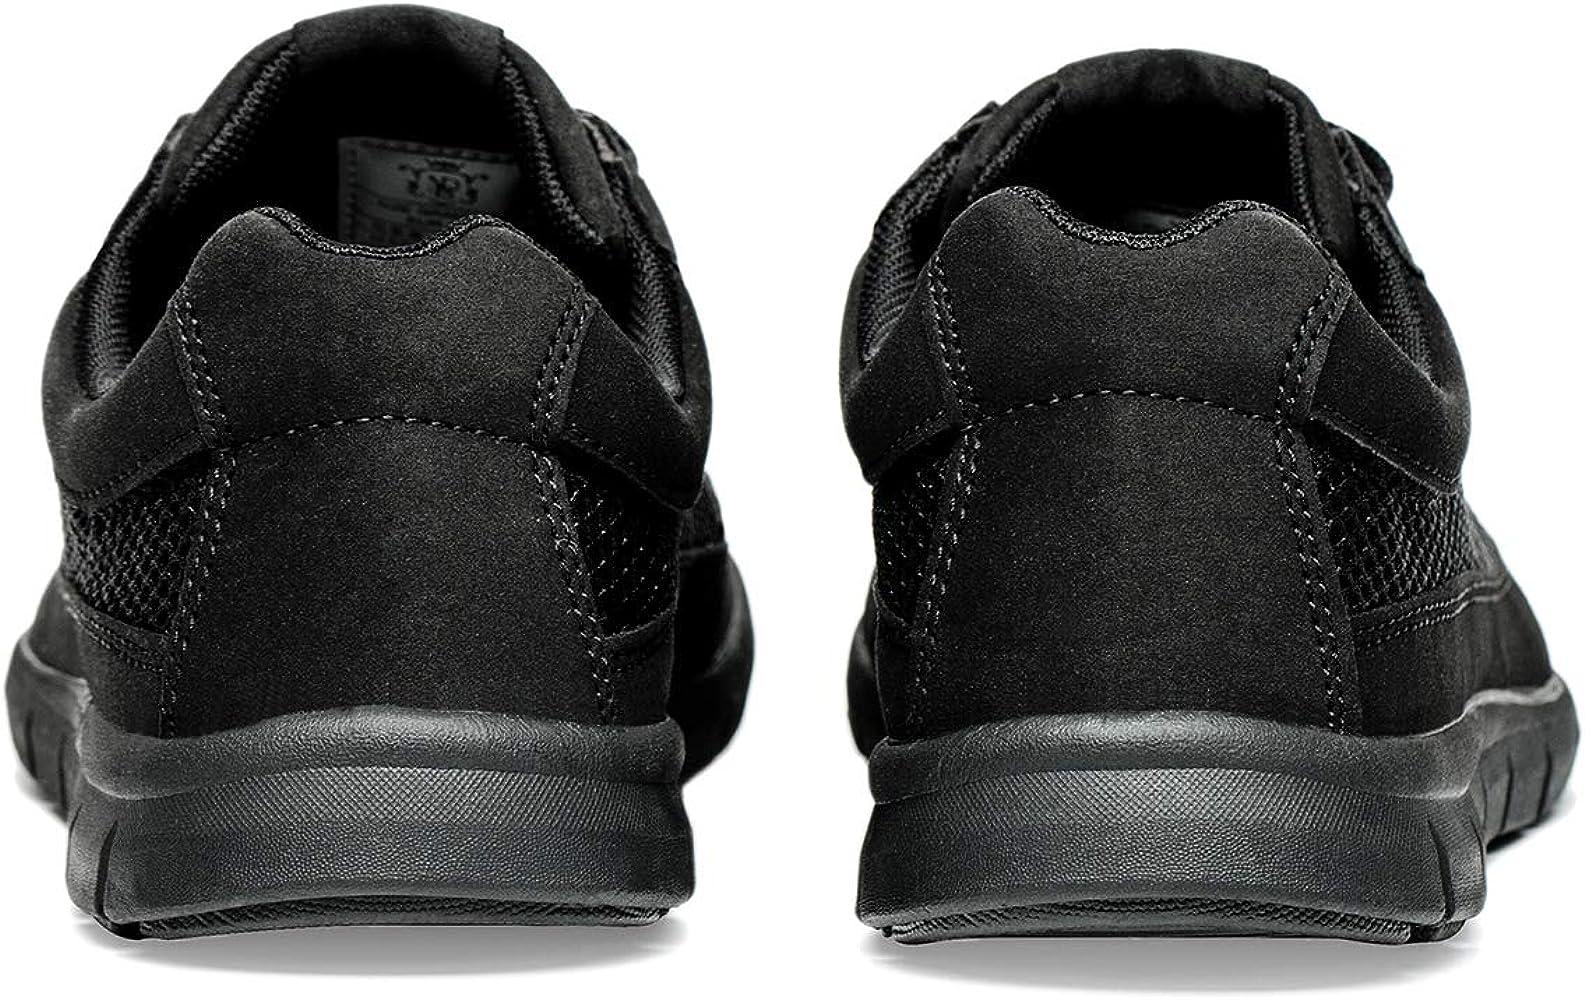 NDB - Zapatillas de deporte para hombre, color Negro, talla 39 EU ...